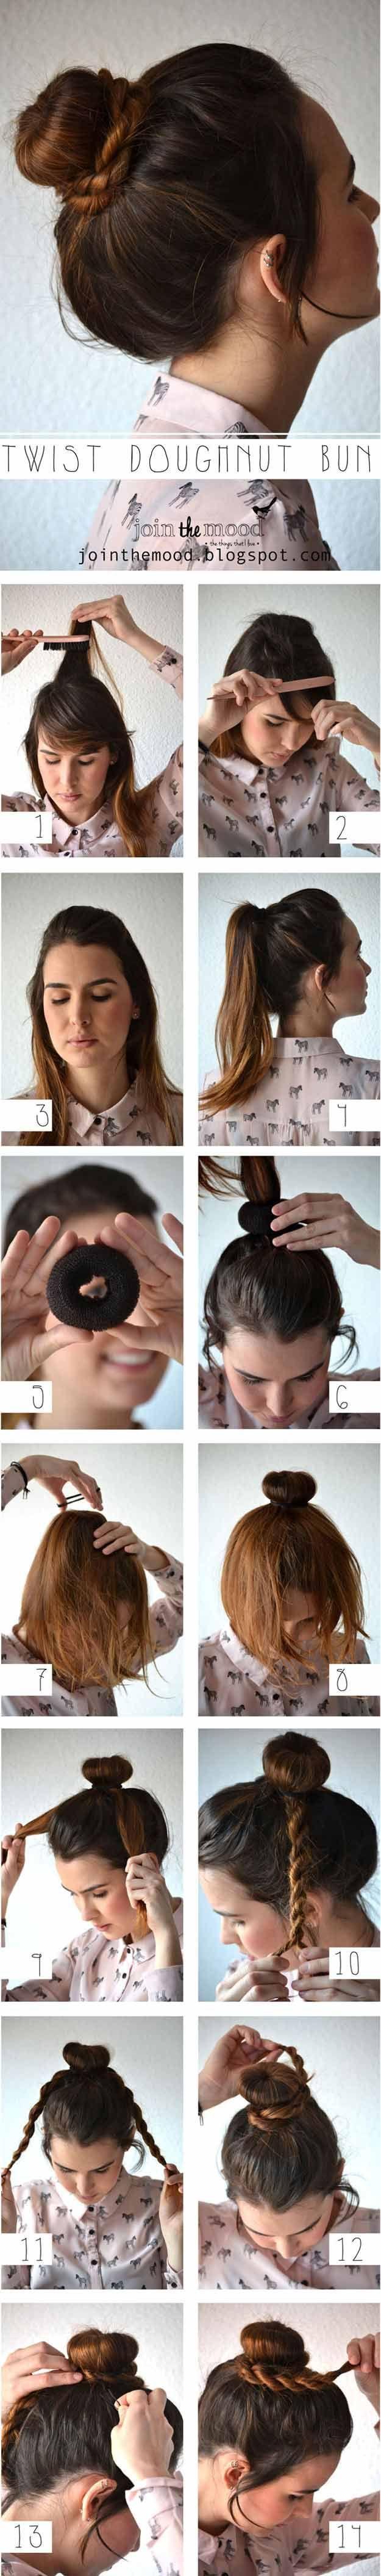 Best Hairstyles For Teens - Twist Doughnut Bun- Easy And Cute Haircuts And Hairs...